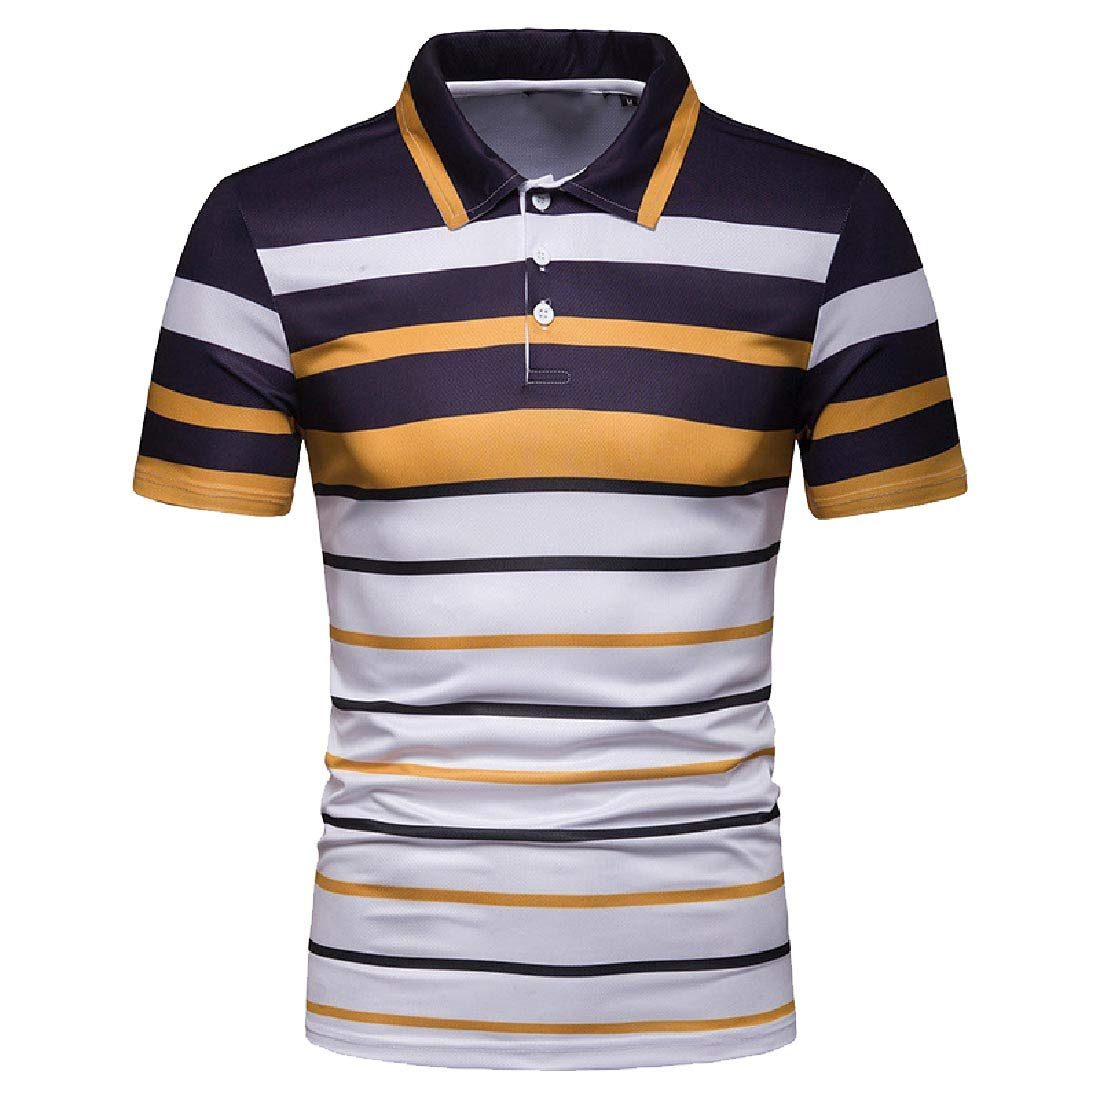 Comaba Mens Short-Sleeve Stripes Slim-Fit Casual Regular Pique Polo Shirt